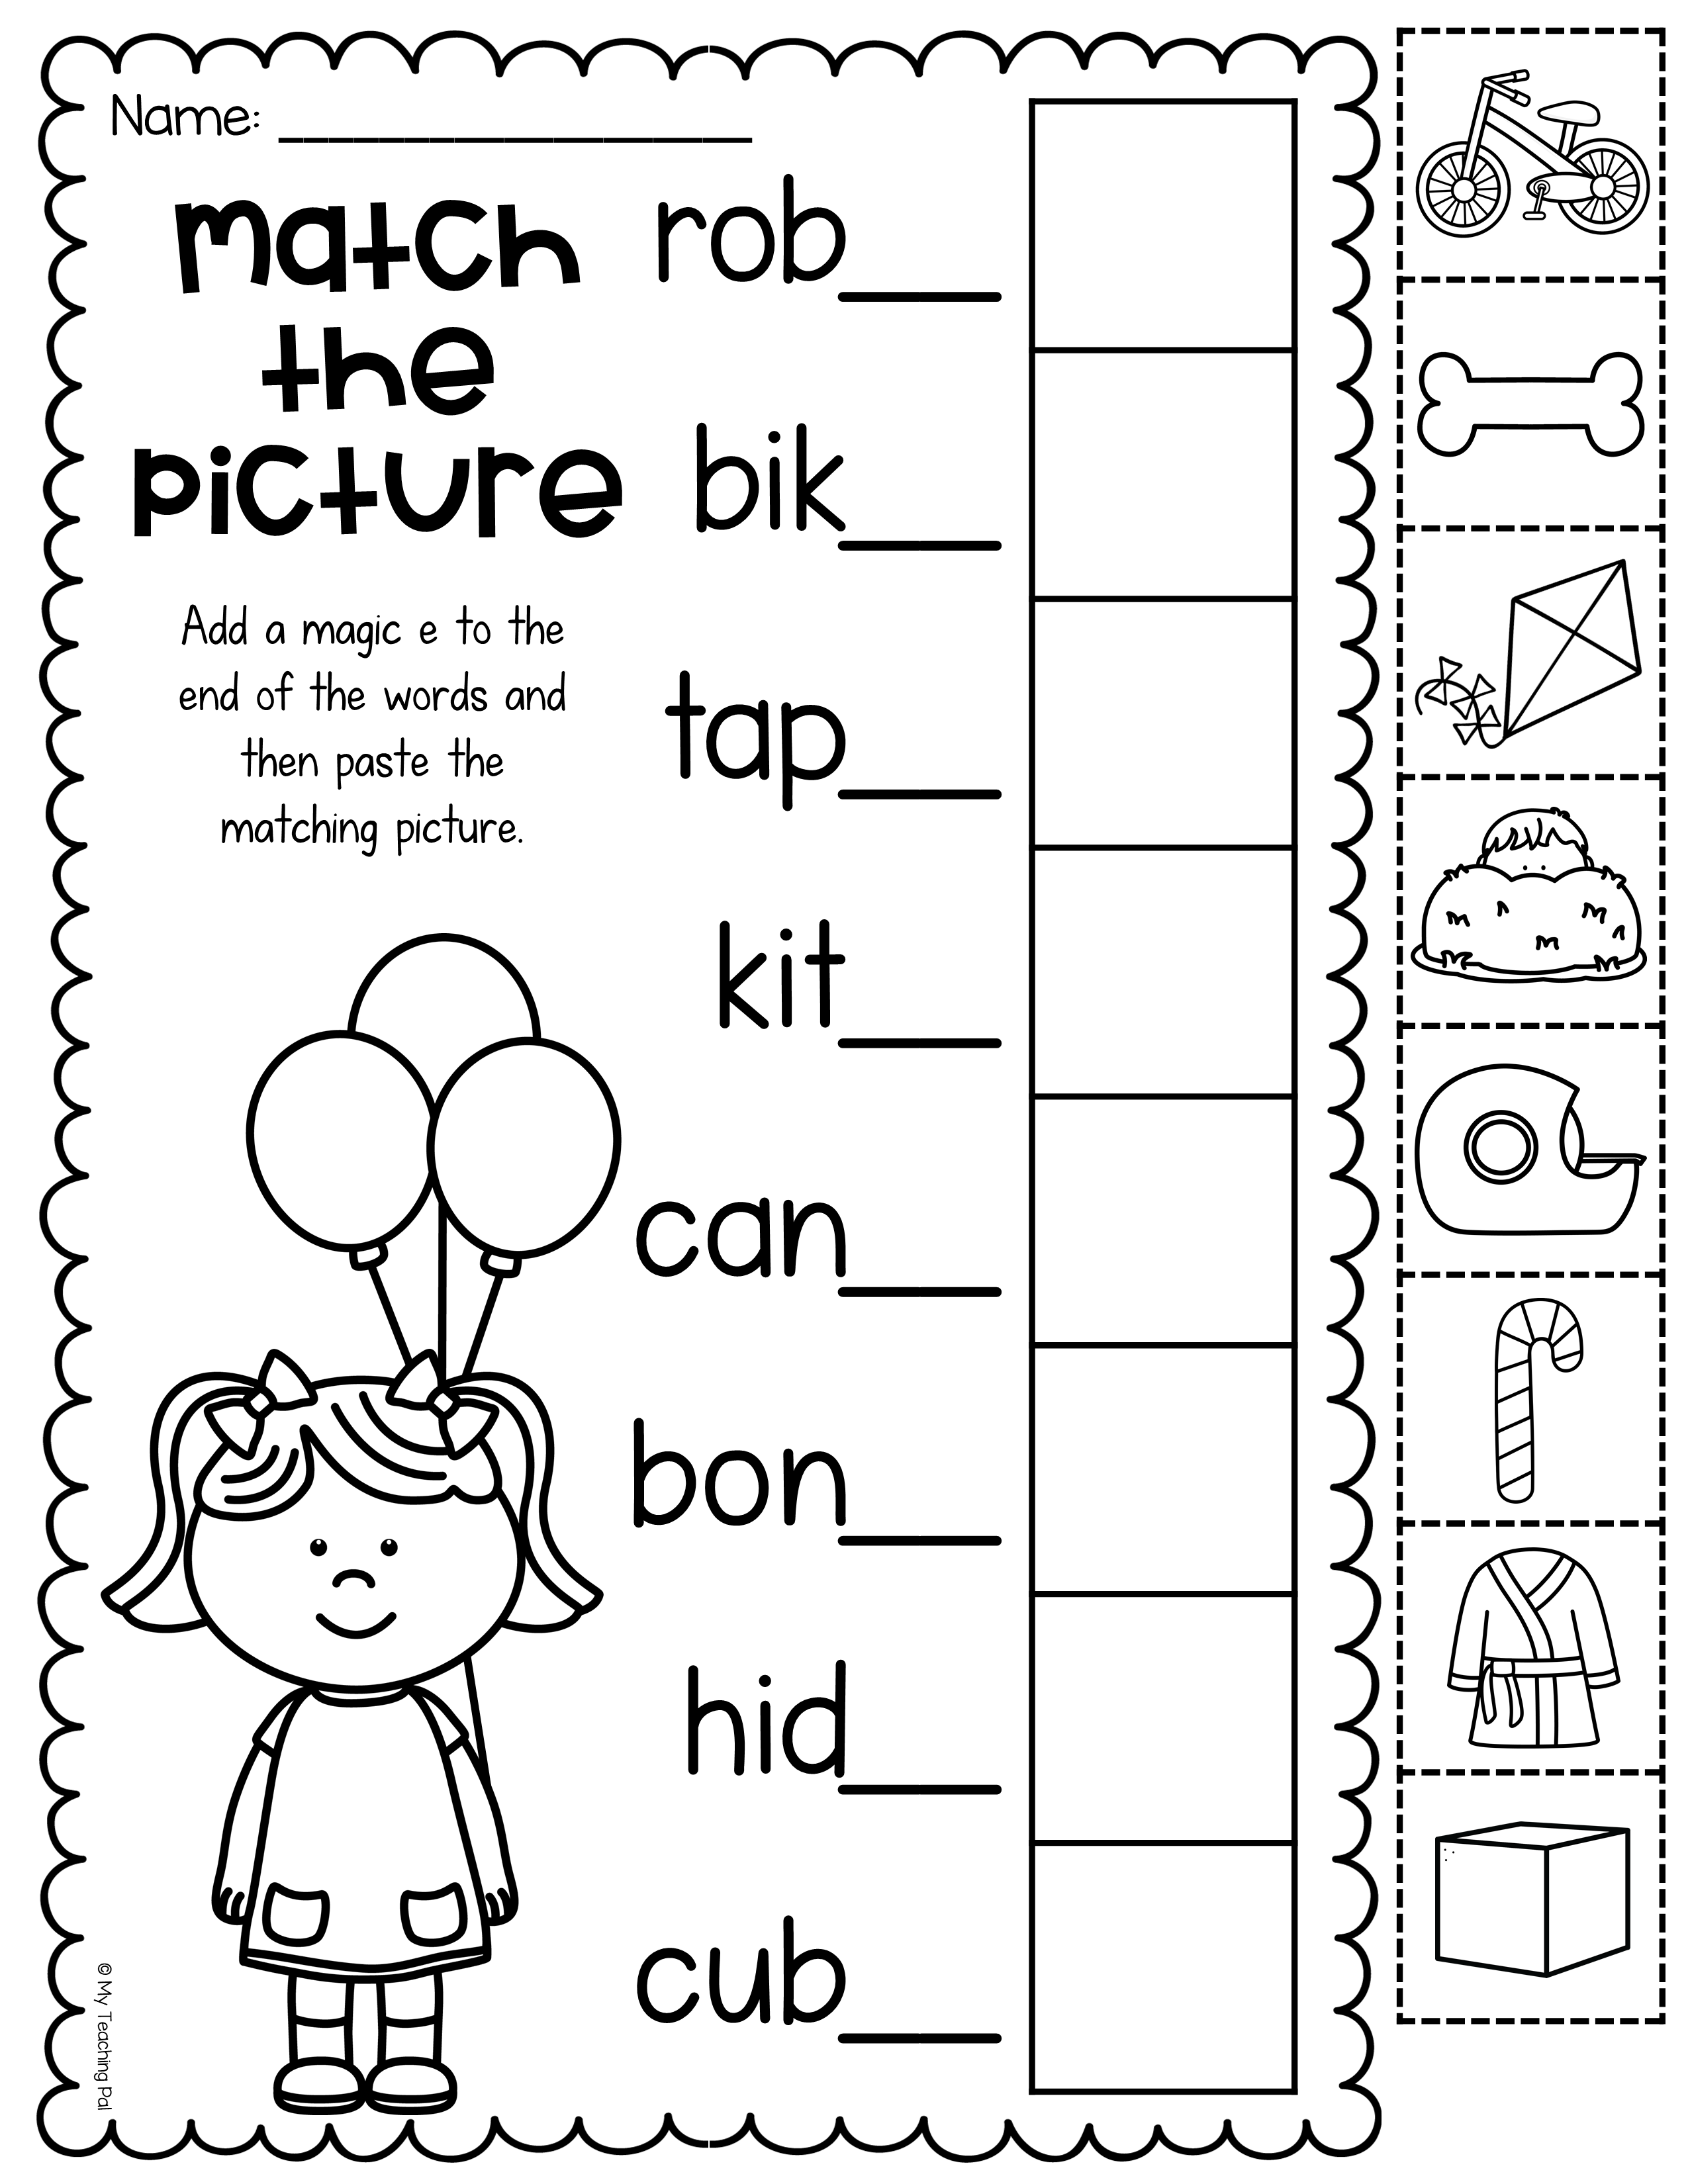 Bossy e worksheet   Preschool phonics [ 3300 x 2550 Pixel ]